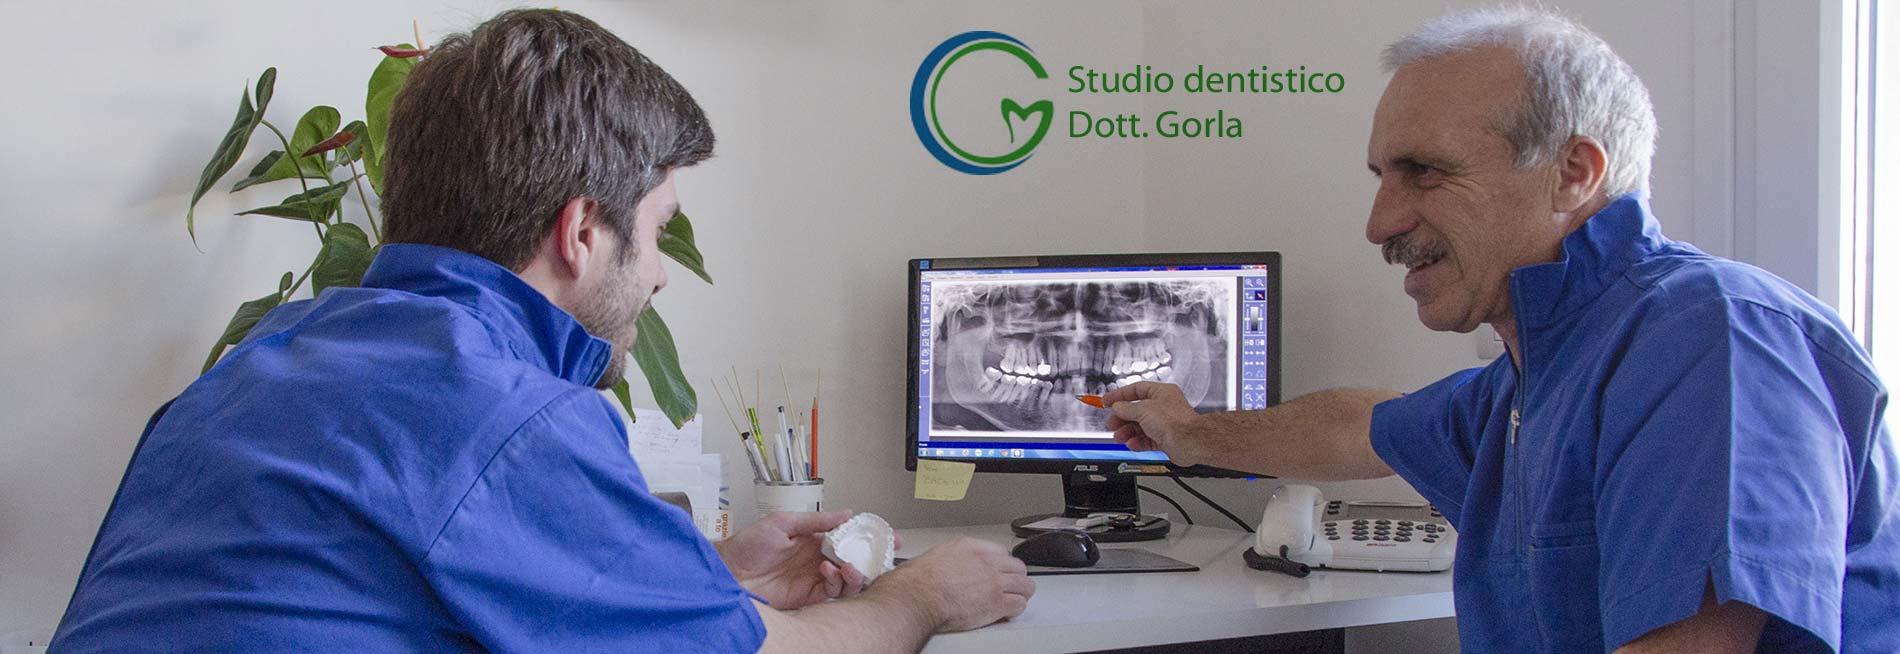 dentista-milano-slide13